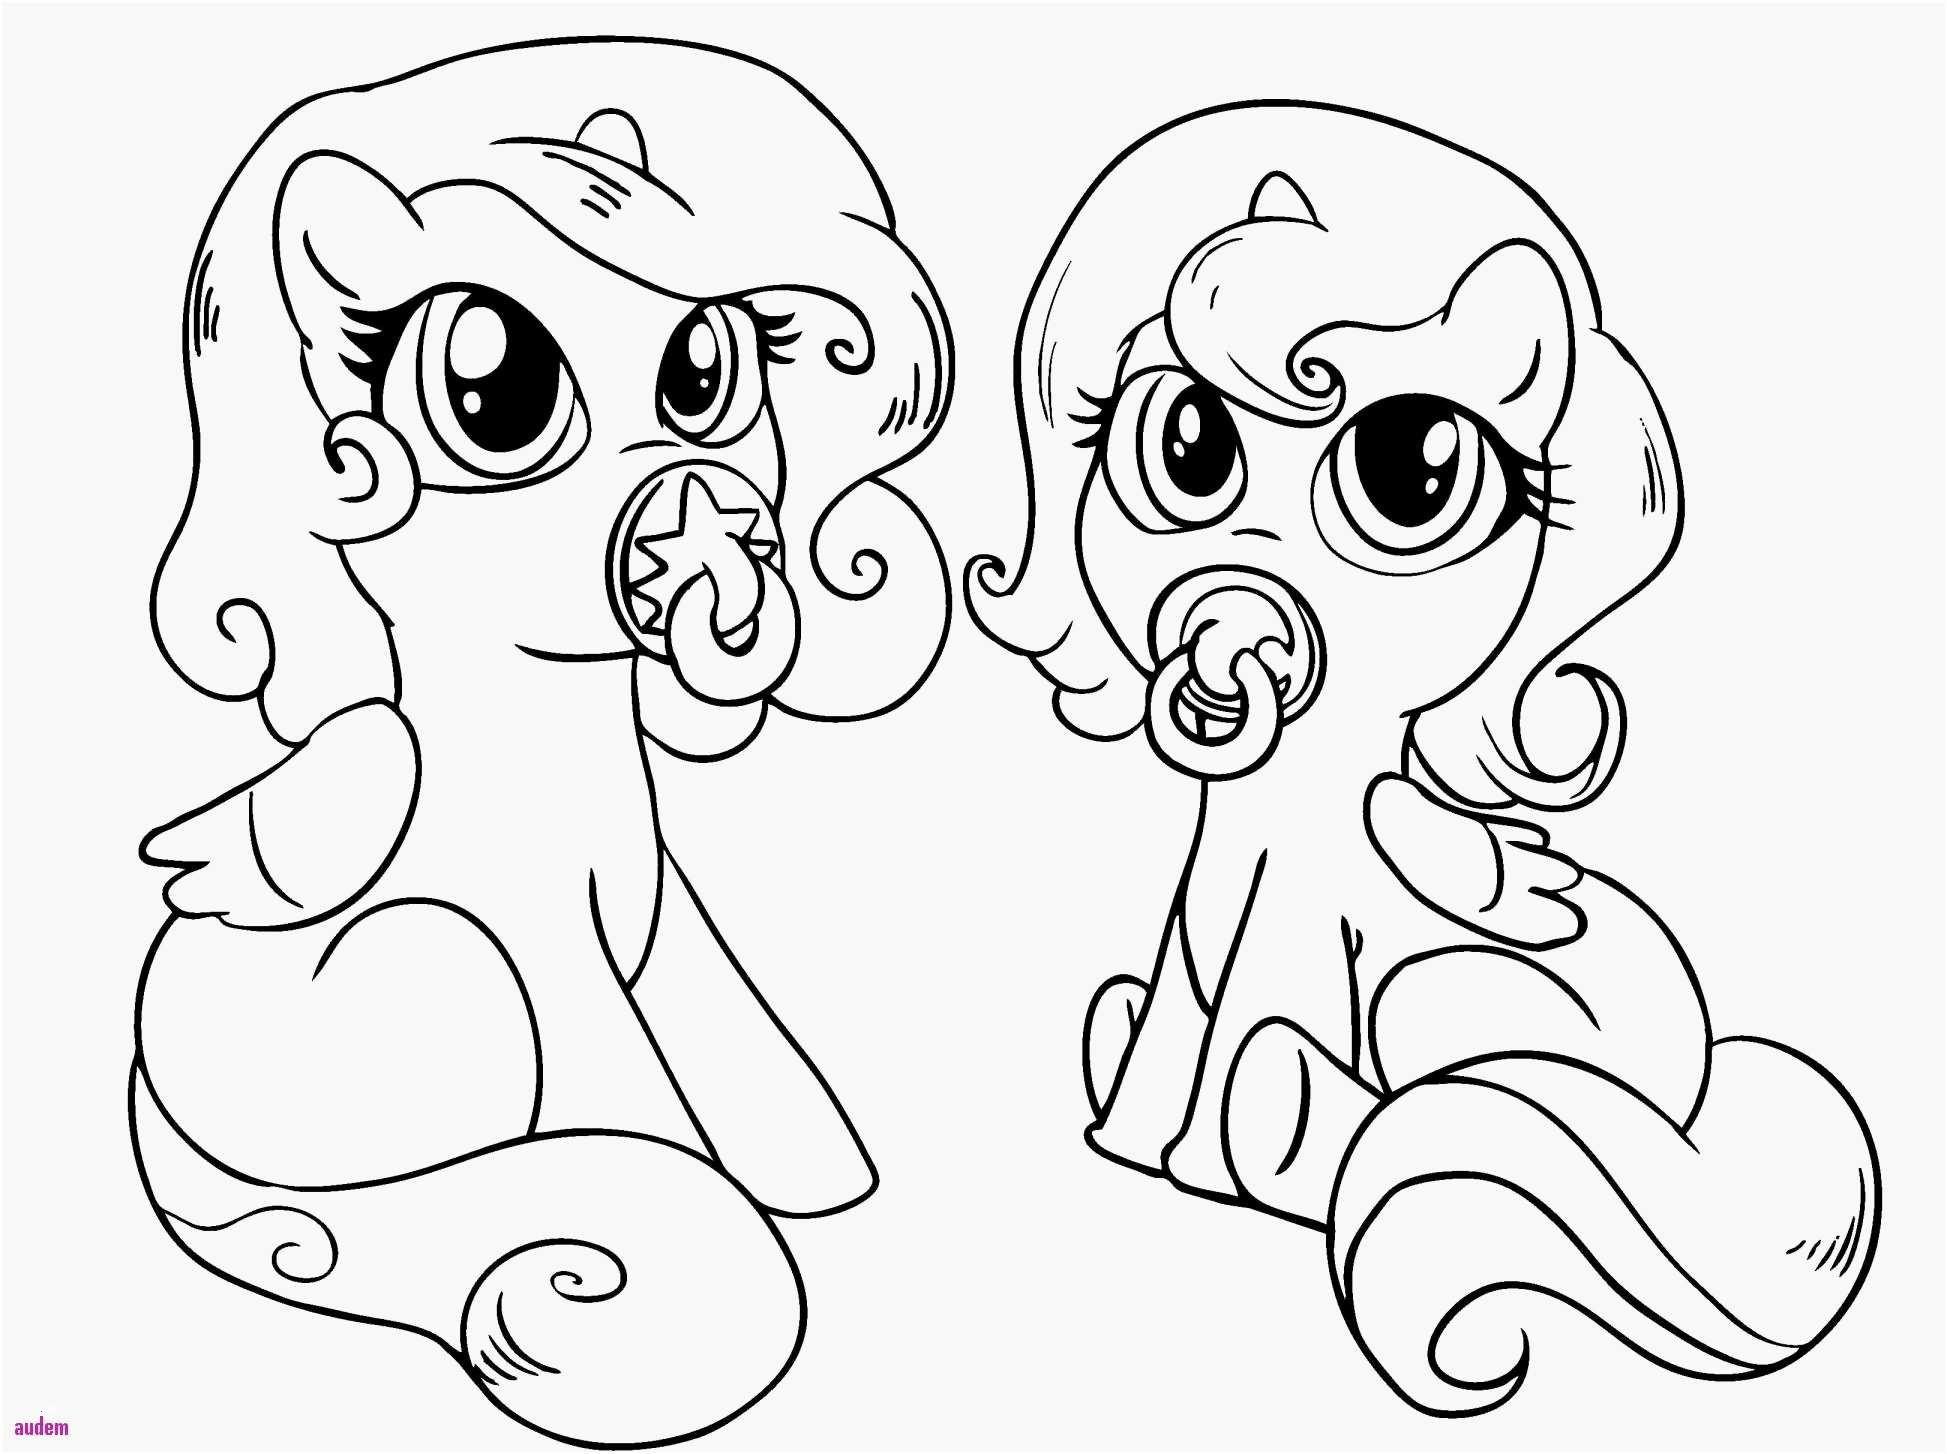 Ausmalbilder My Little Pony Equestria Girl Frisch Ausmalbilder My Little Pony Equestria Girl Frisch Equestria Girl Bild